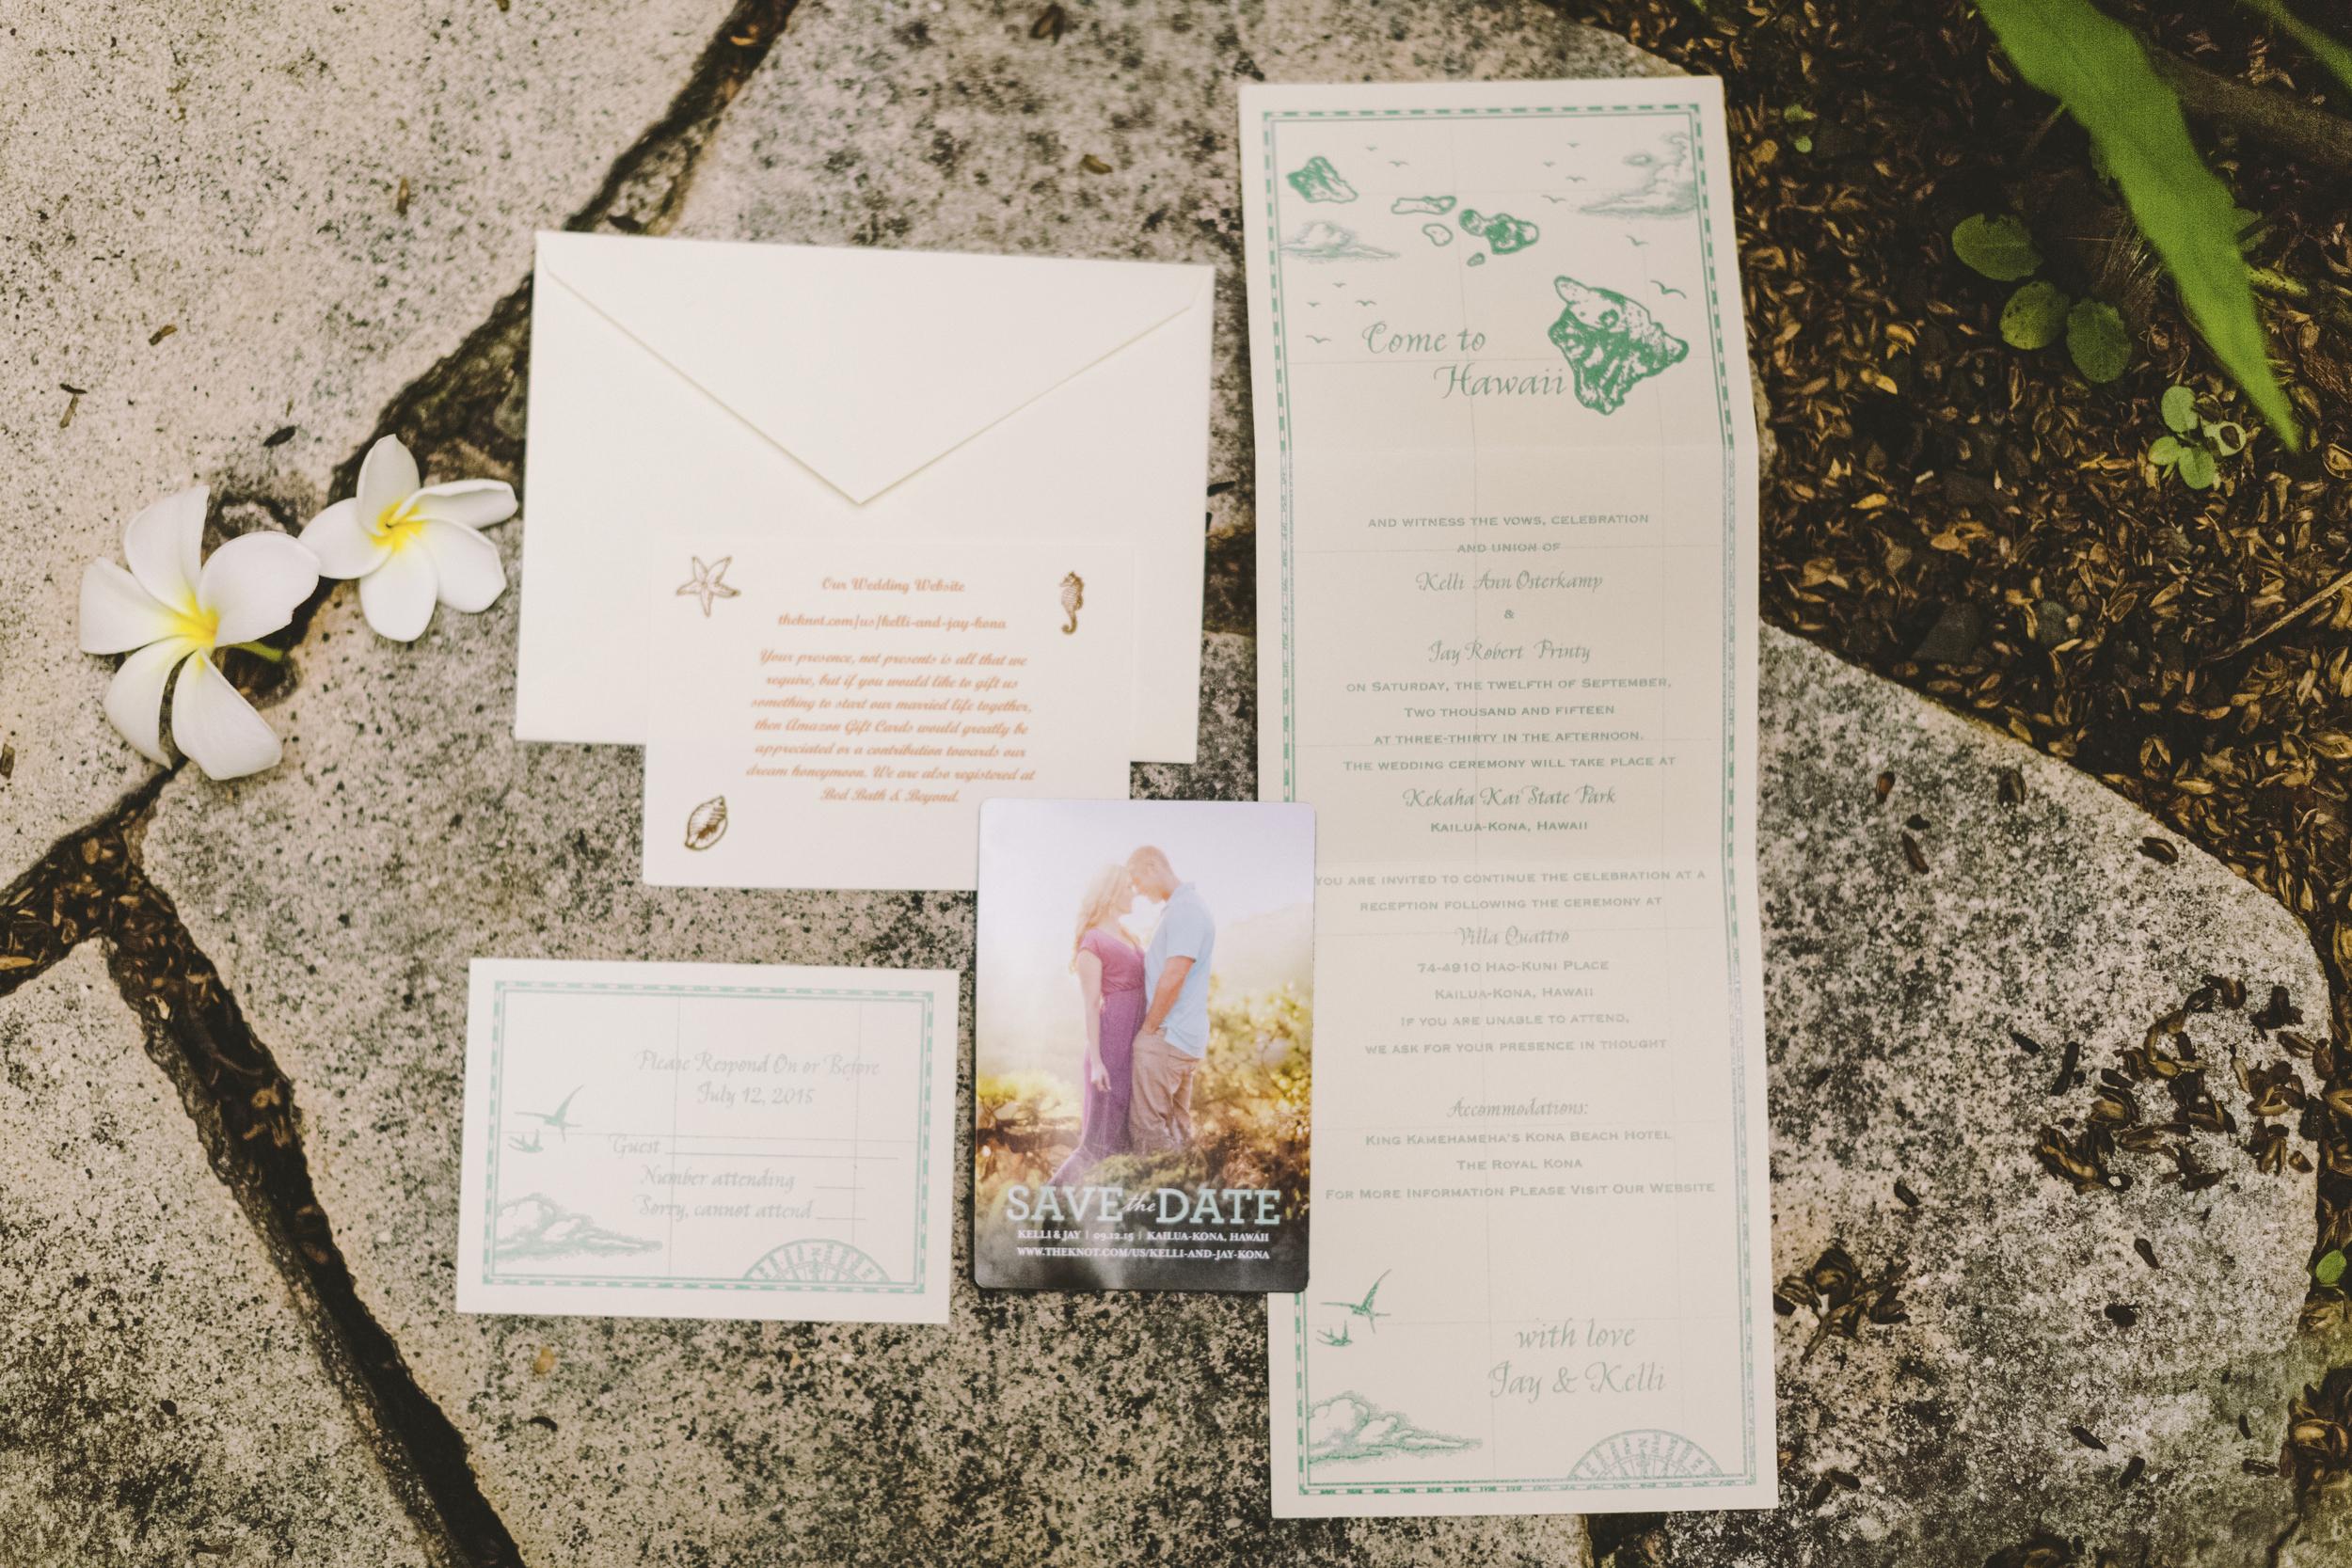 angie-diaz-photography-hawaii-wedding-photographer-kelli-jay-2.jpg